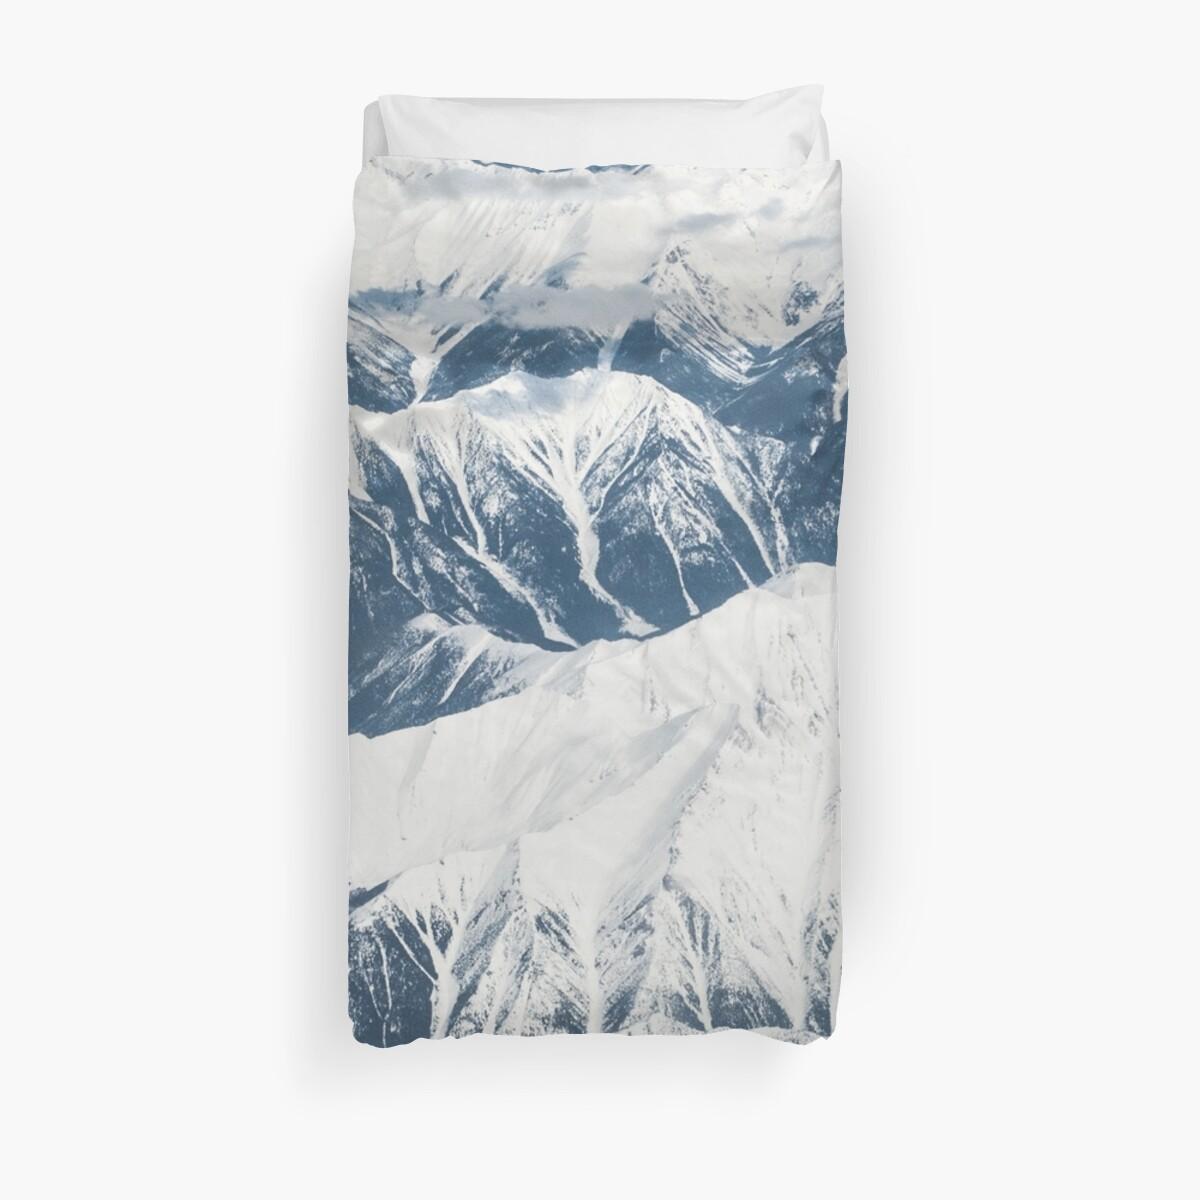 Alps Snow Mountain Range by TravelDream